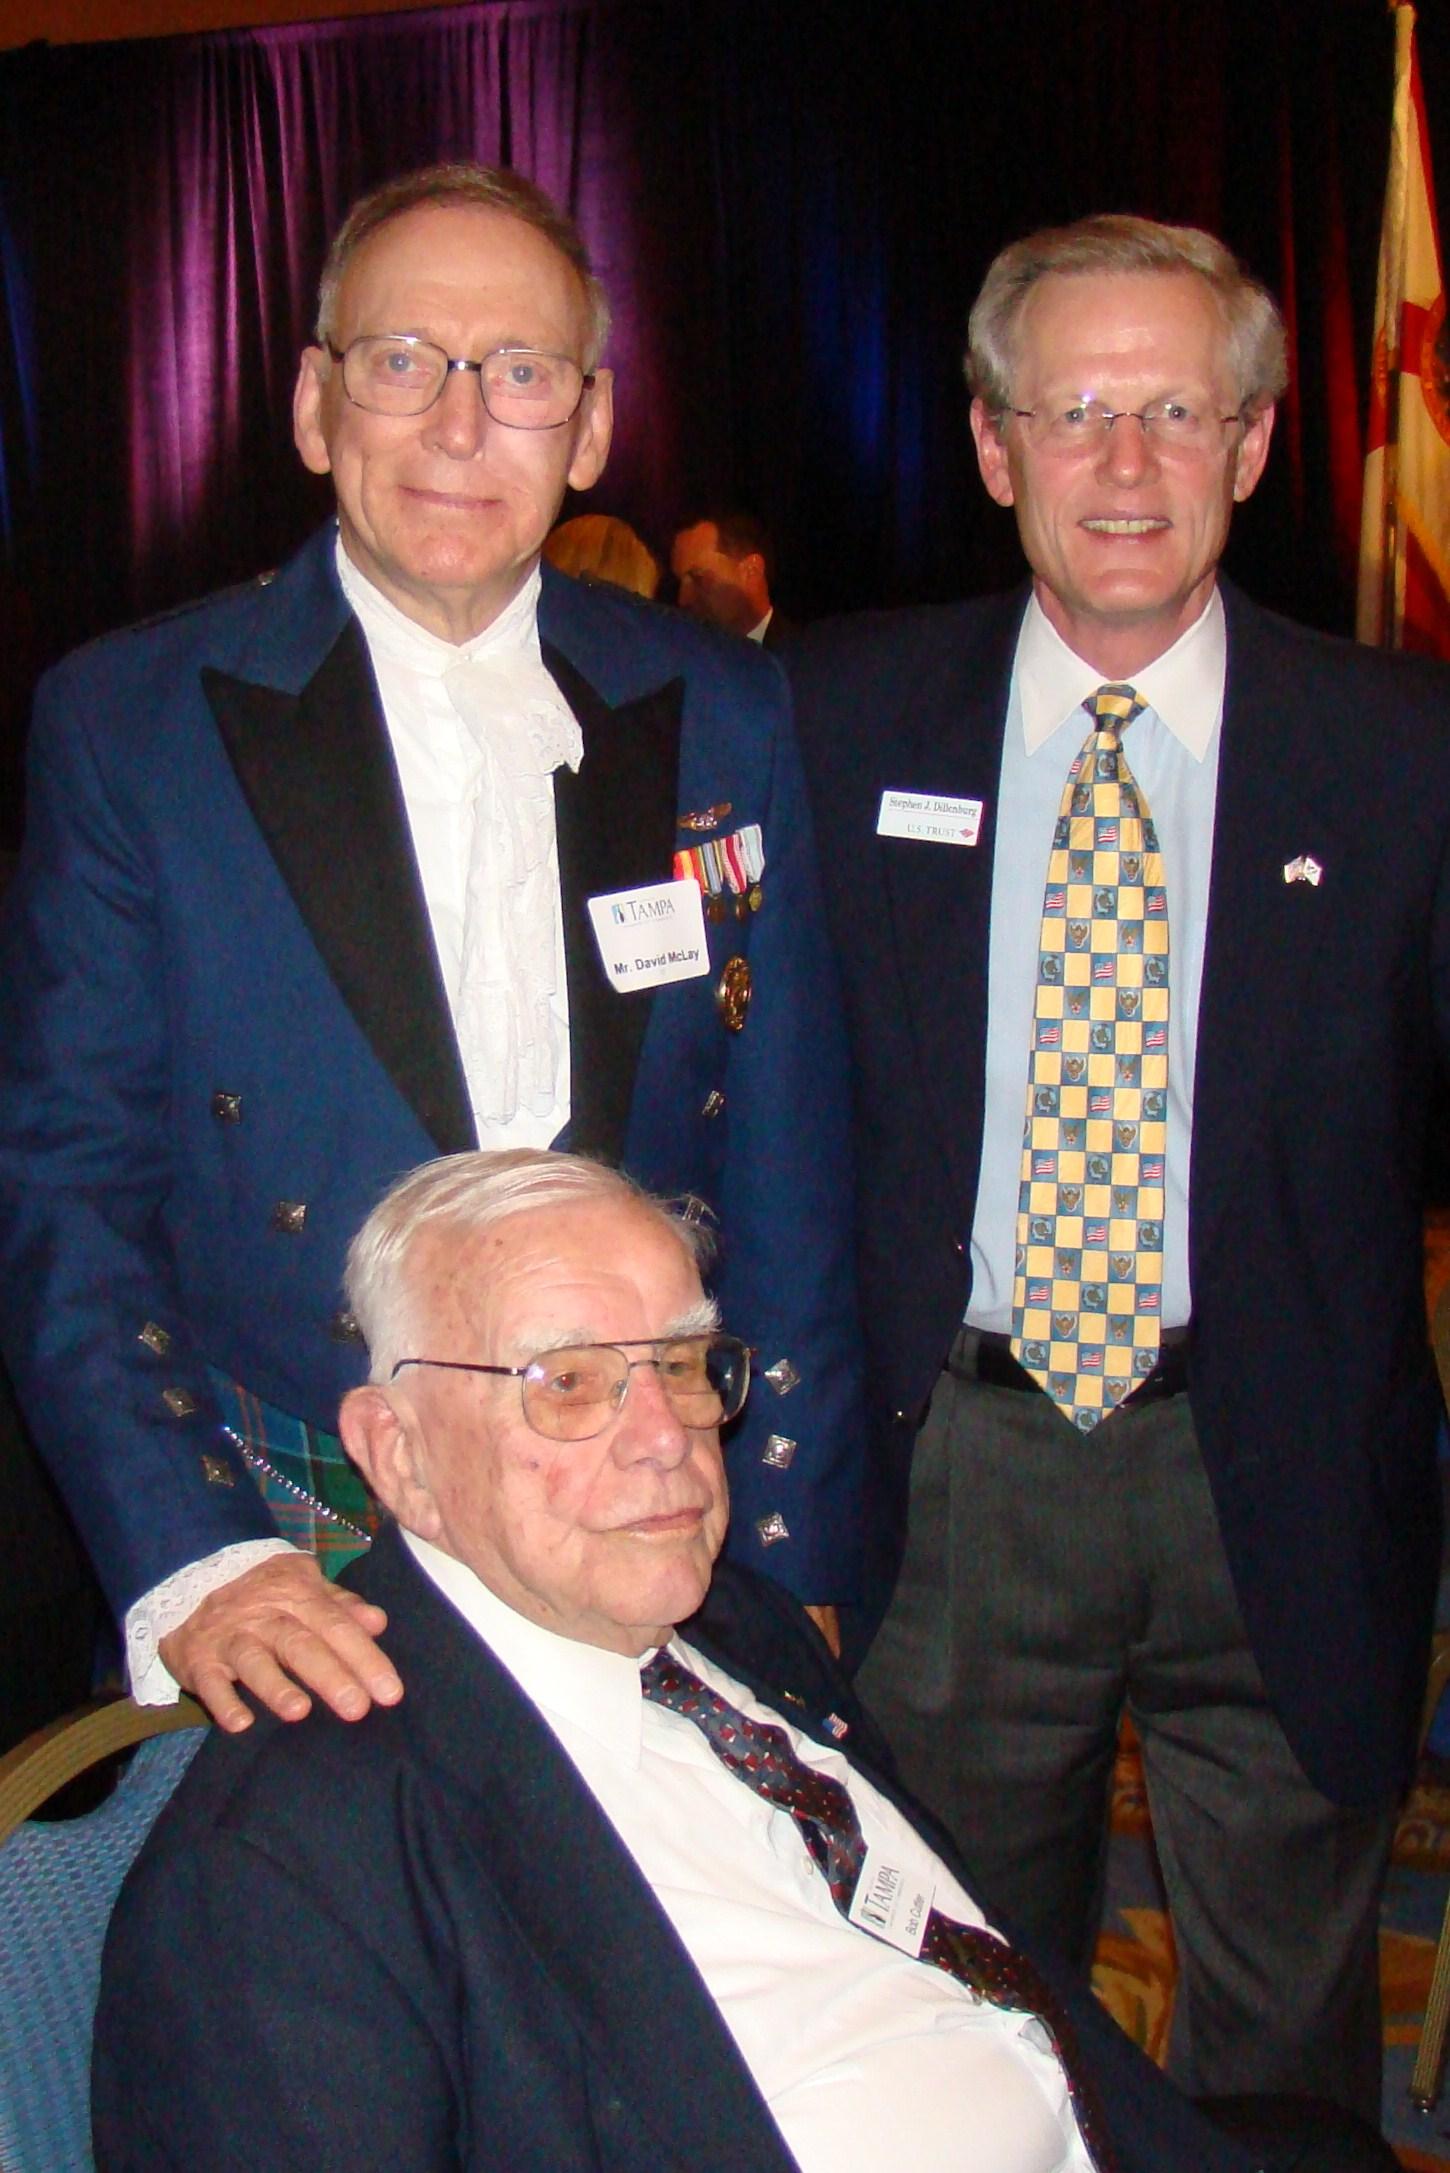 David McLay & Steve Dillenburg with Bob Cutler, 16 Feb '10.JPG